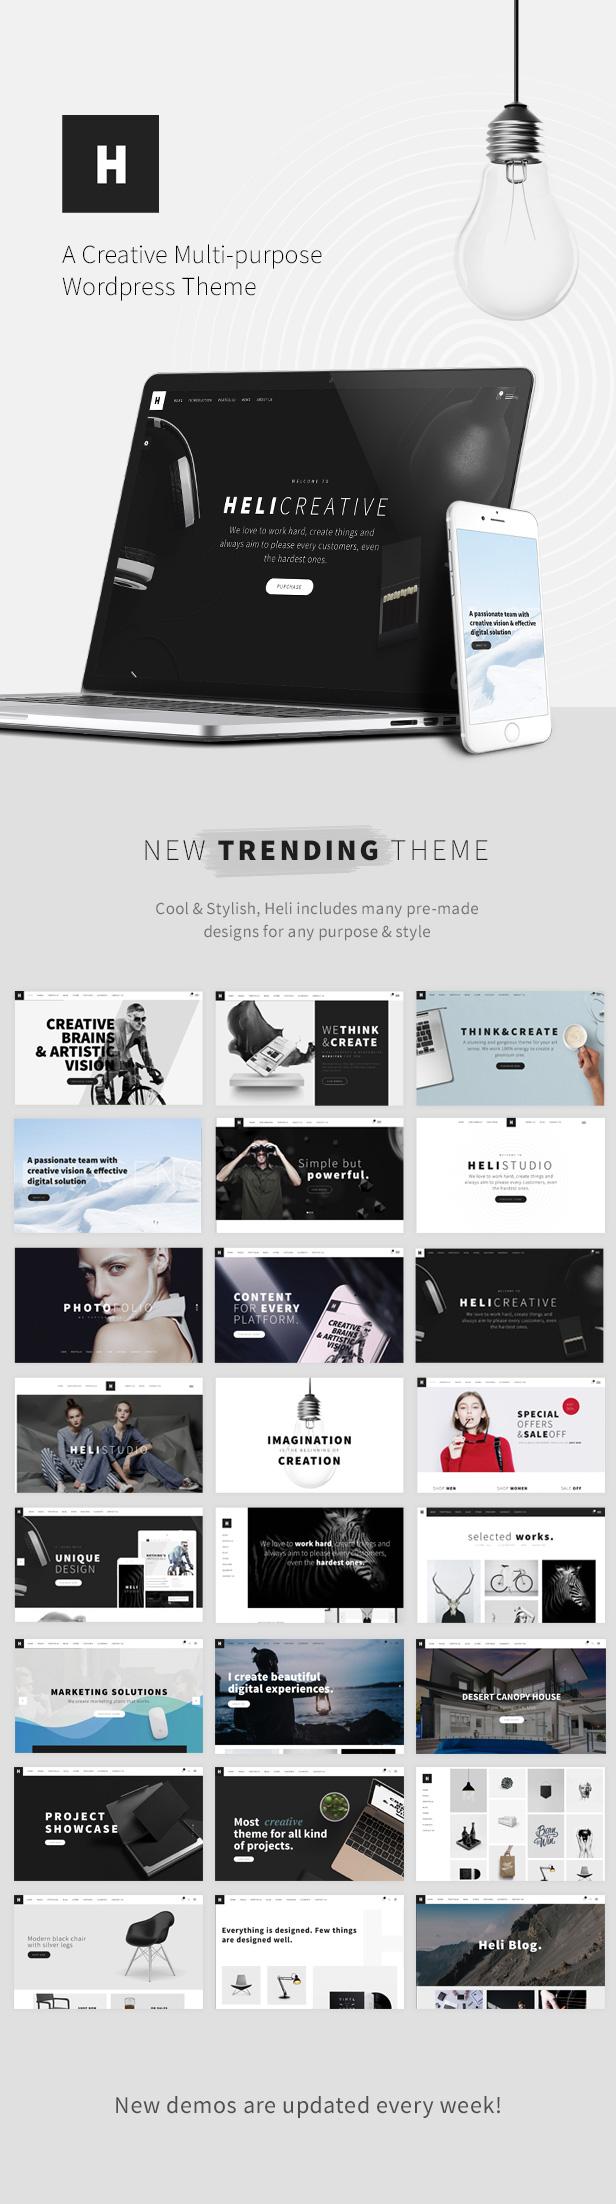 1622292823 824 8 - Heli - Minimal Creative Black and White WordPress Theme